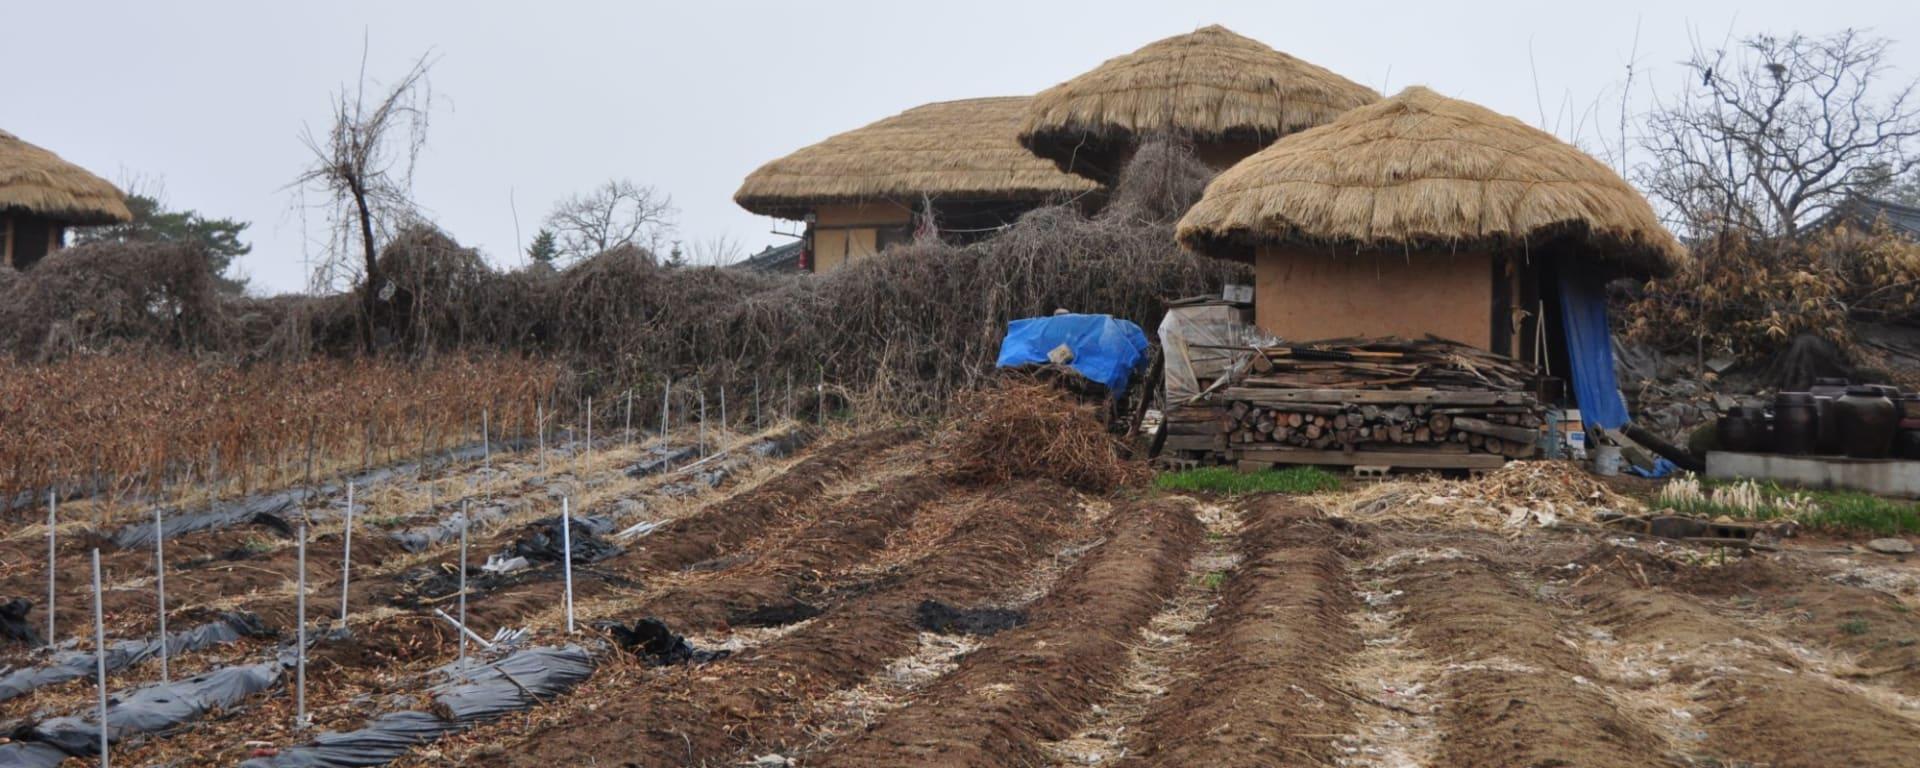 Südkorea - Grosse Mietwagenrundreise ab Seoul: Andong Hahoe Folk village